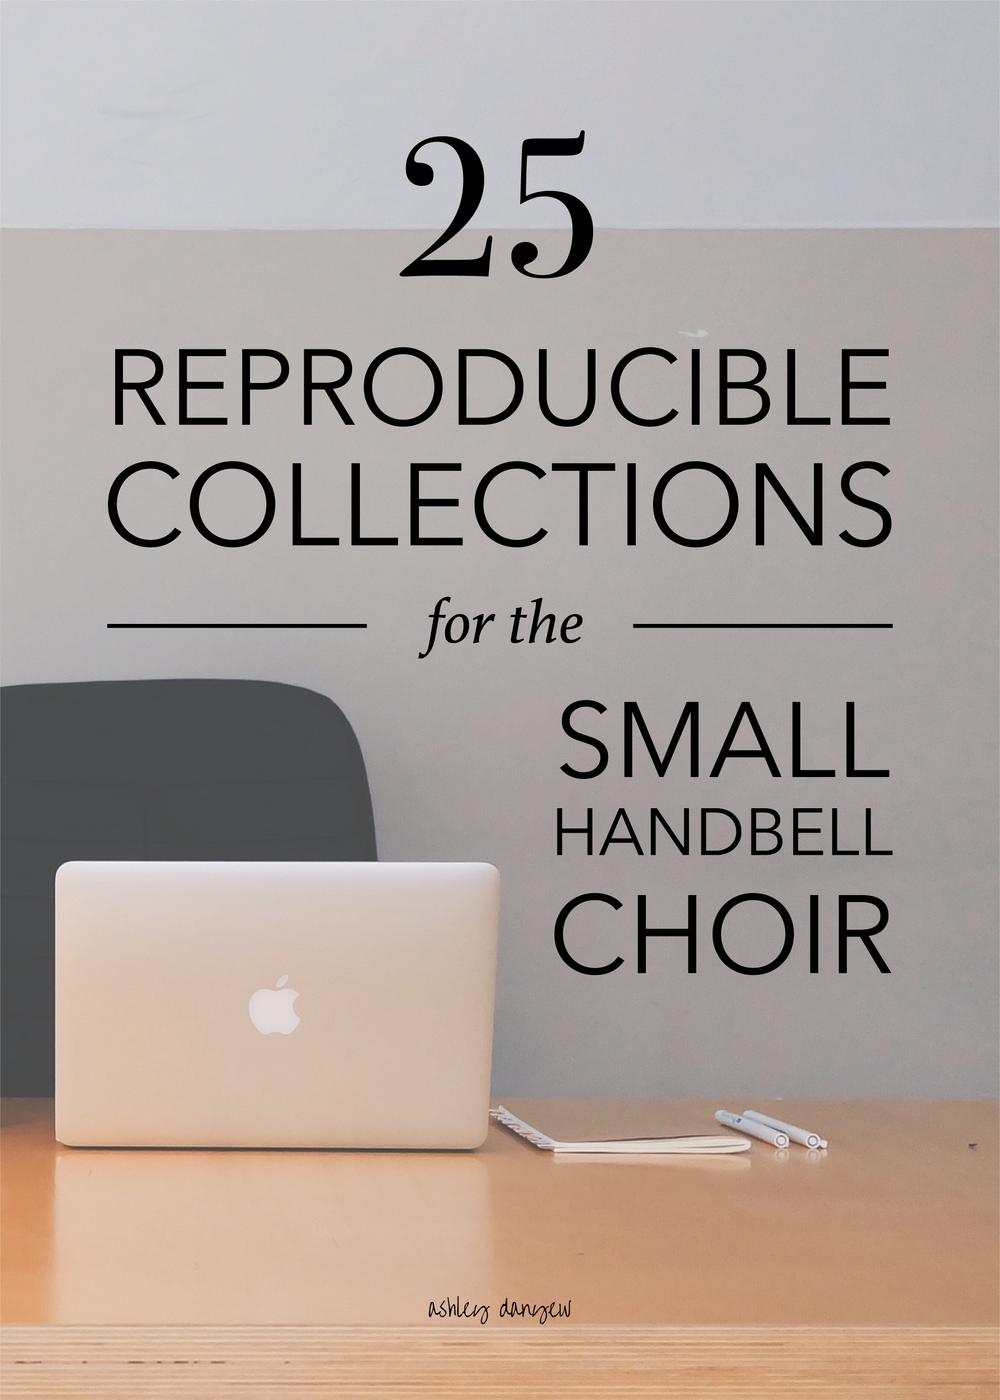 Copy of 25 Reproducible Collections for the Small Handbell Choir